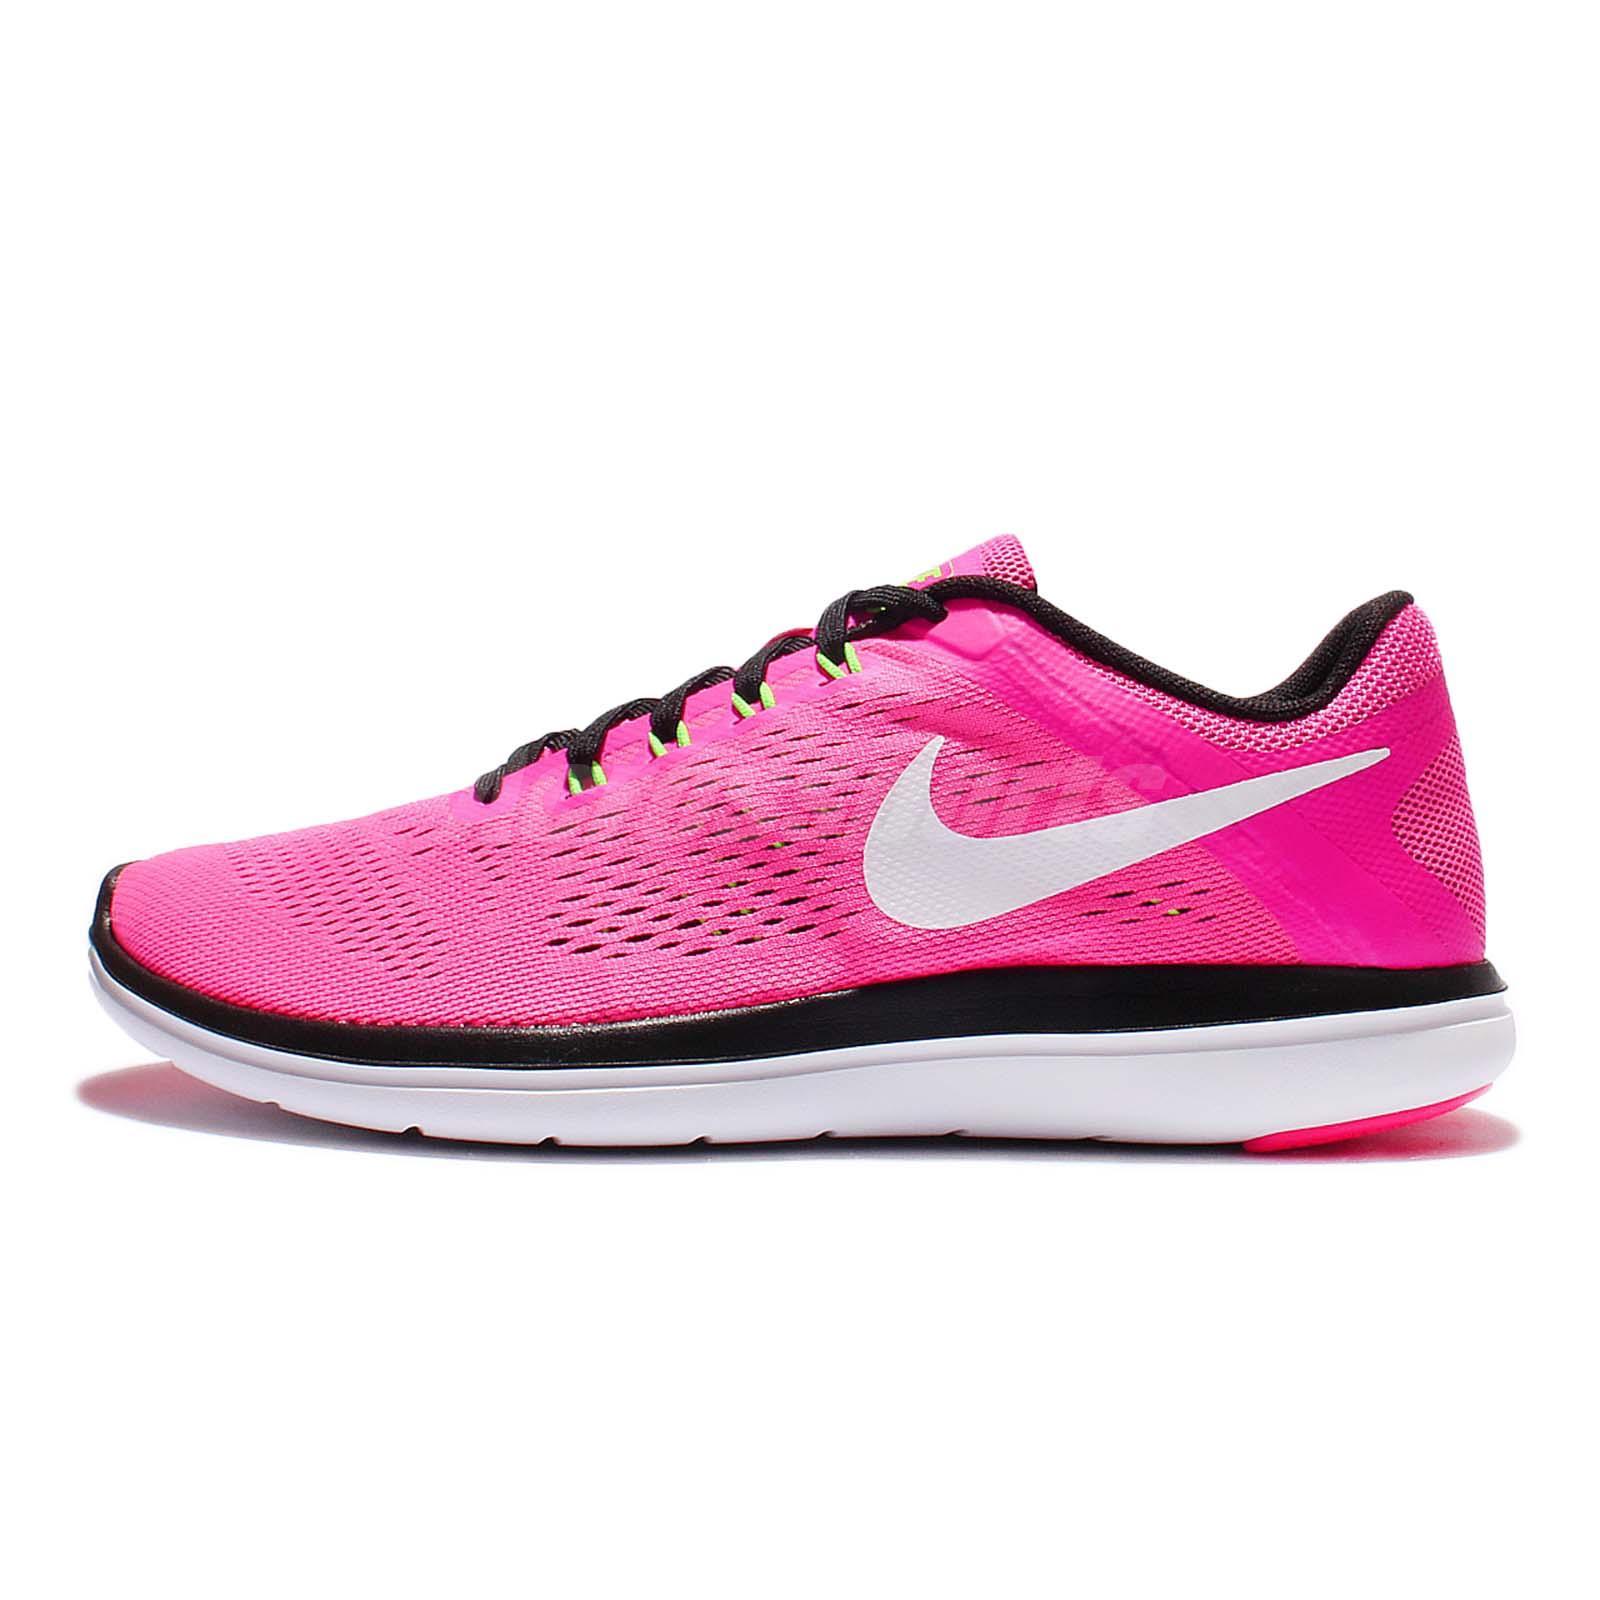 wmns nike flex 2016 rn run pink black womens running shoes trainers 830751 600 ebay. Black Bedroom Furniture Sets. Home Design Ideas